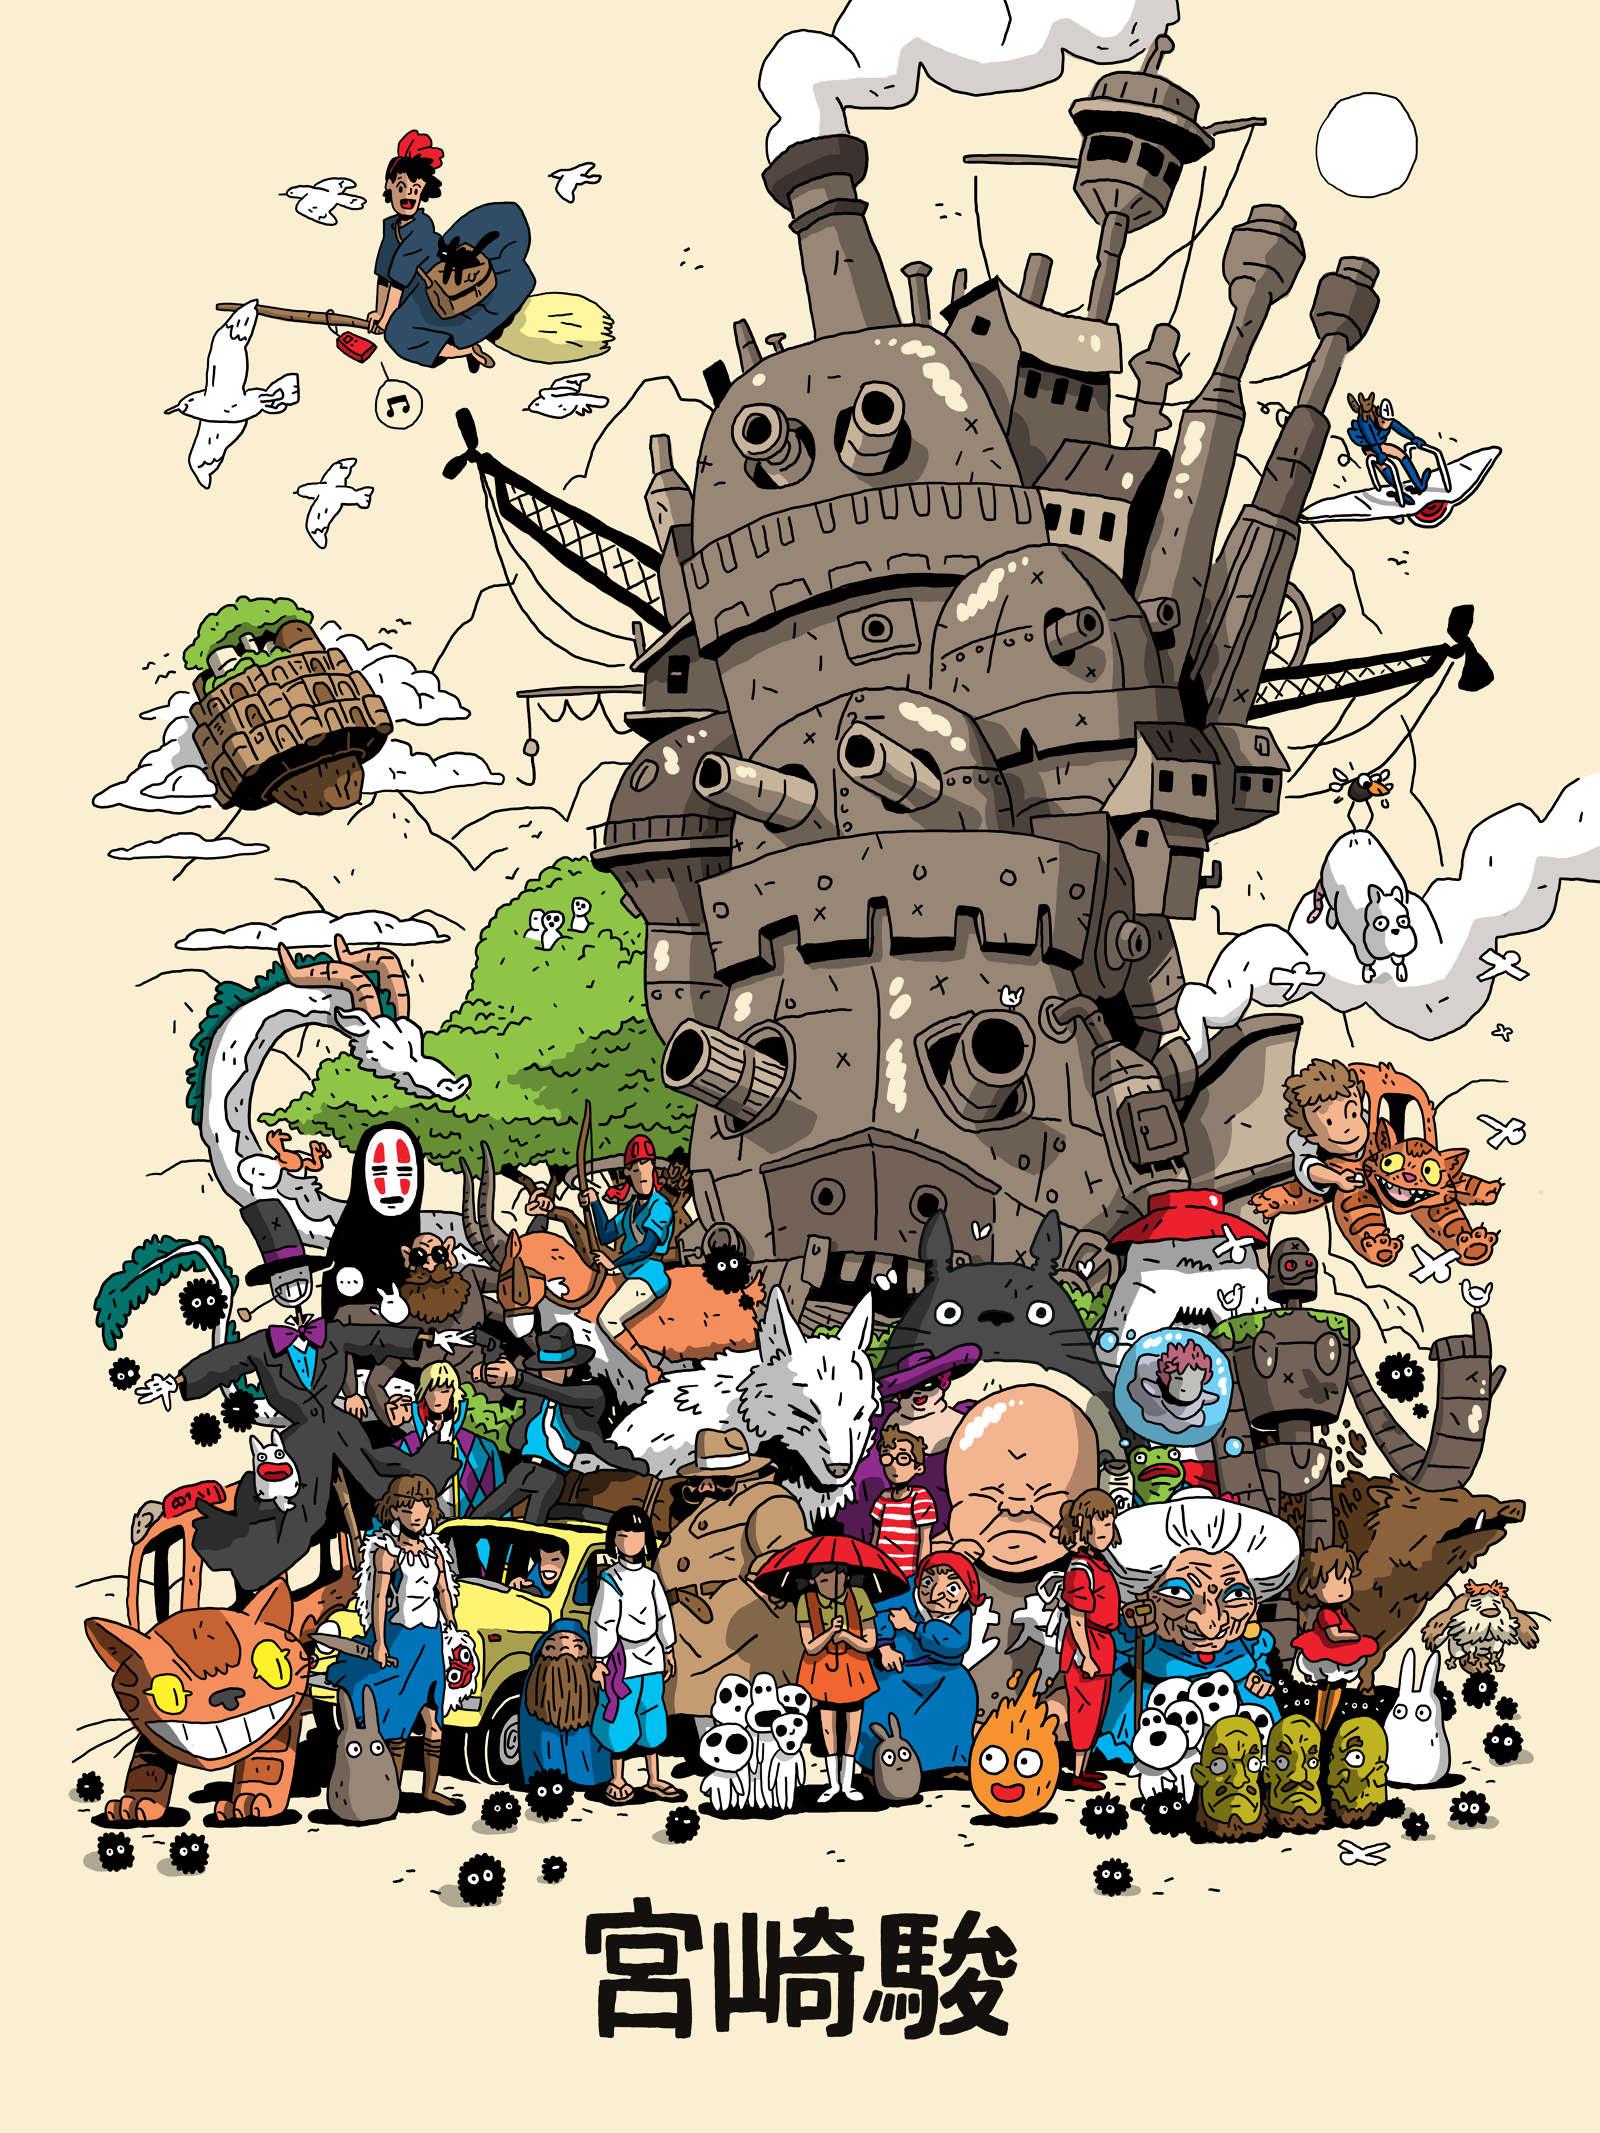 Miyazaki_4-bigger-image-smaller_1600_c.jpg